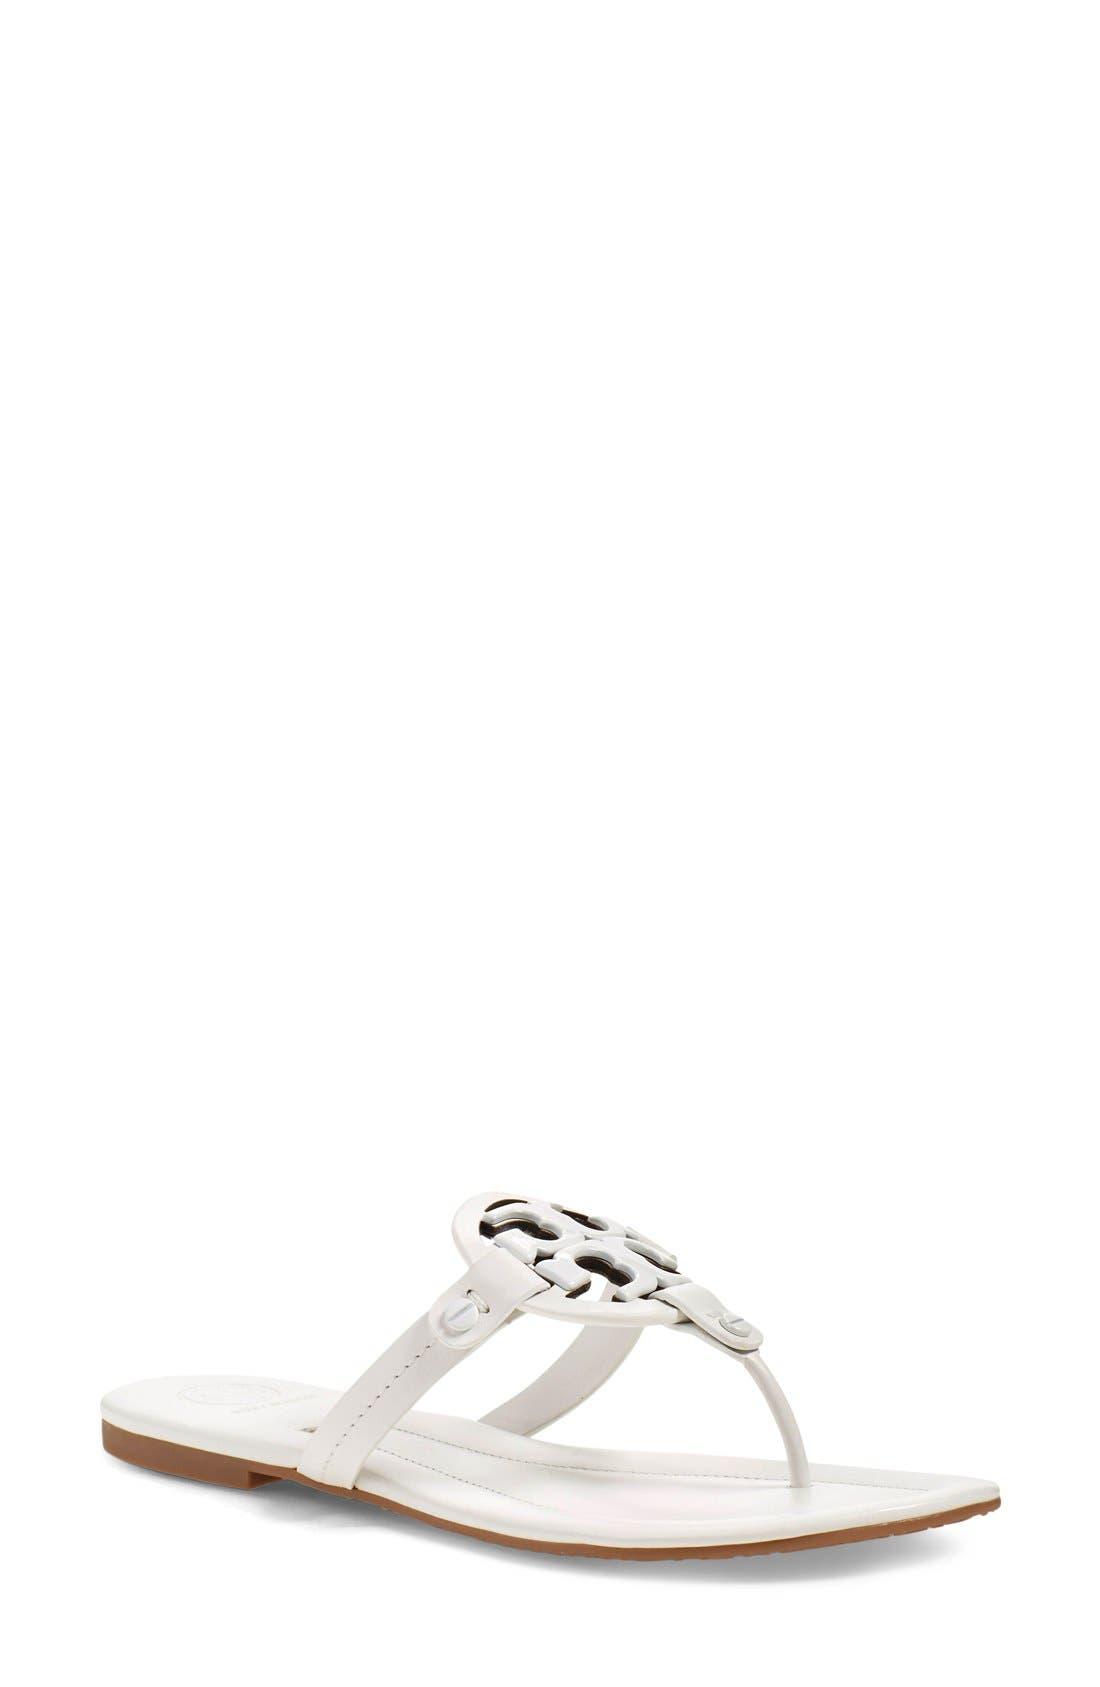 Alternate Image 1 Selected - Tory Burch 'Miller 2' Logo Sandal (Women)